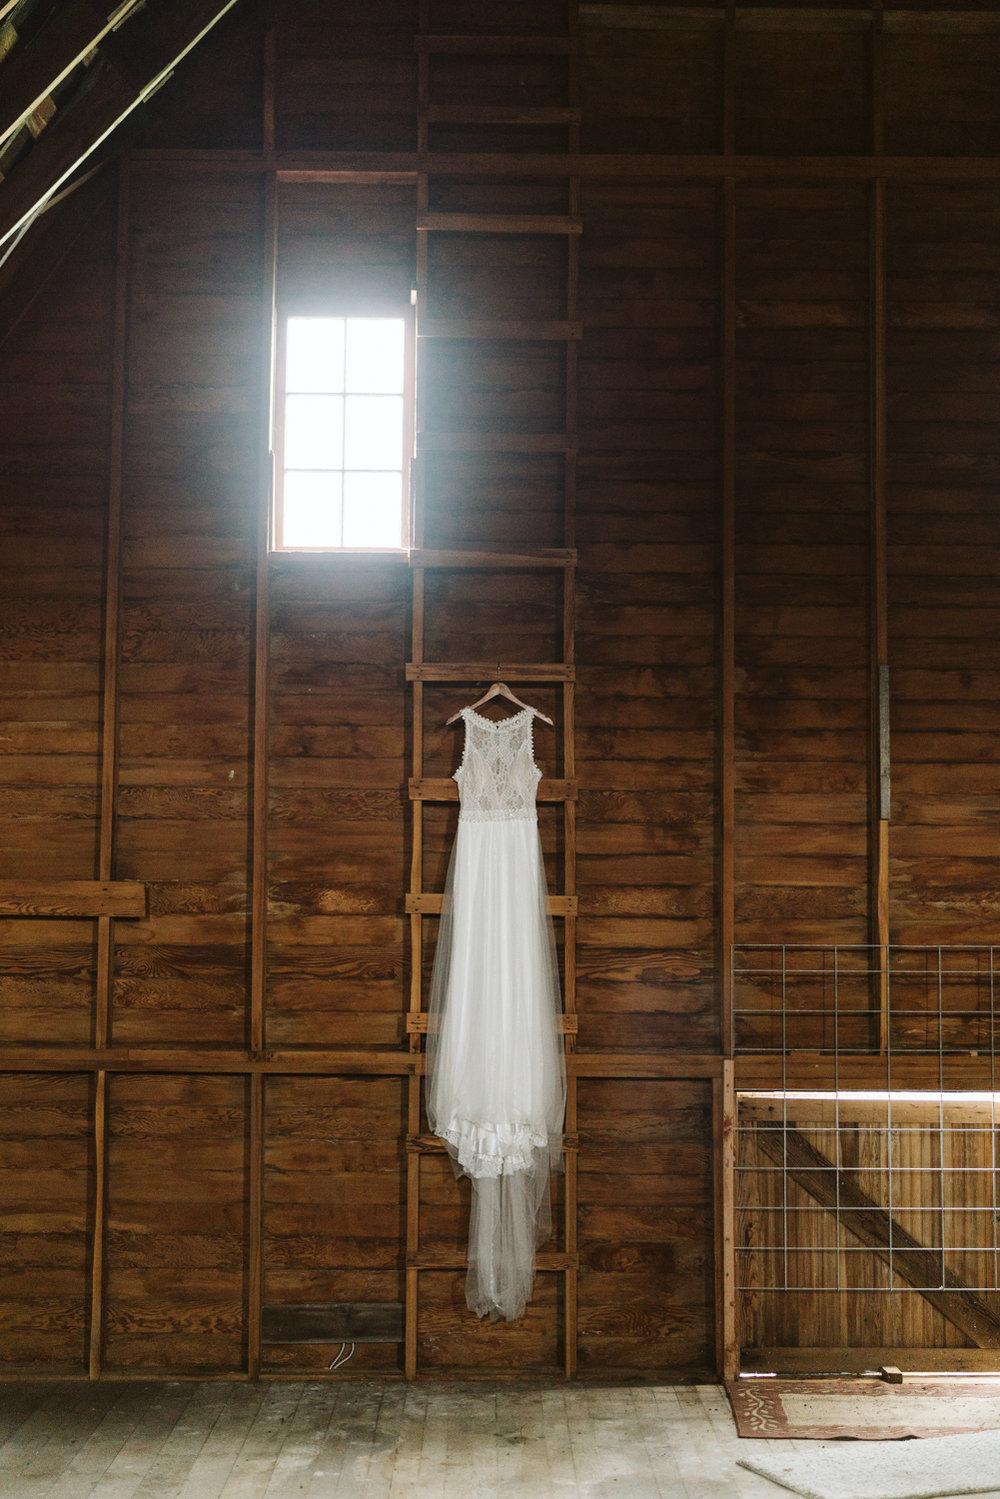 April Yentas Photography - Faberfarm Styled Shoot-10.jpg